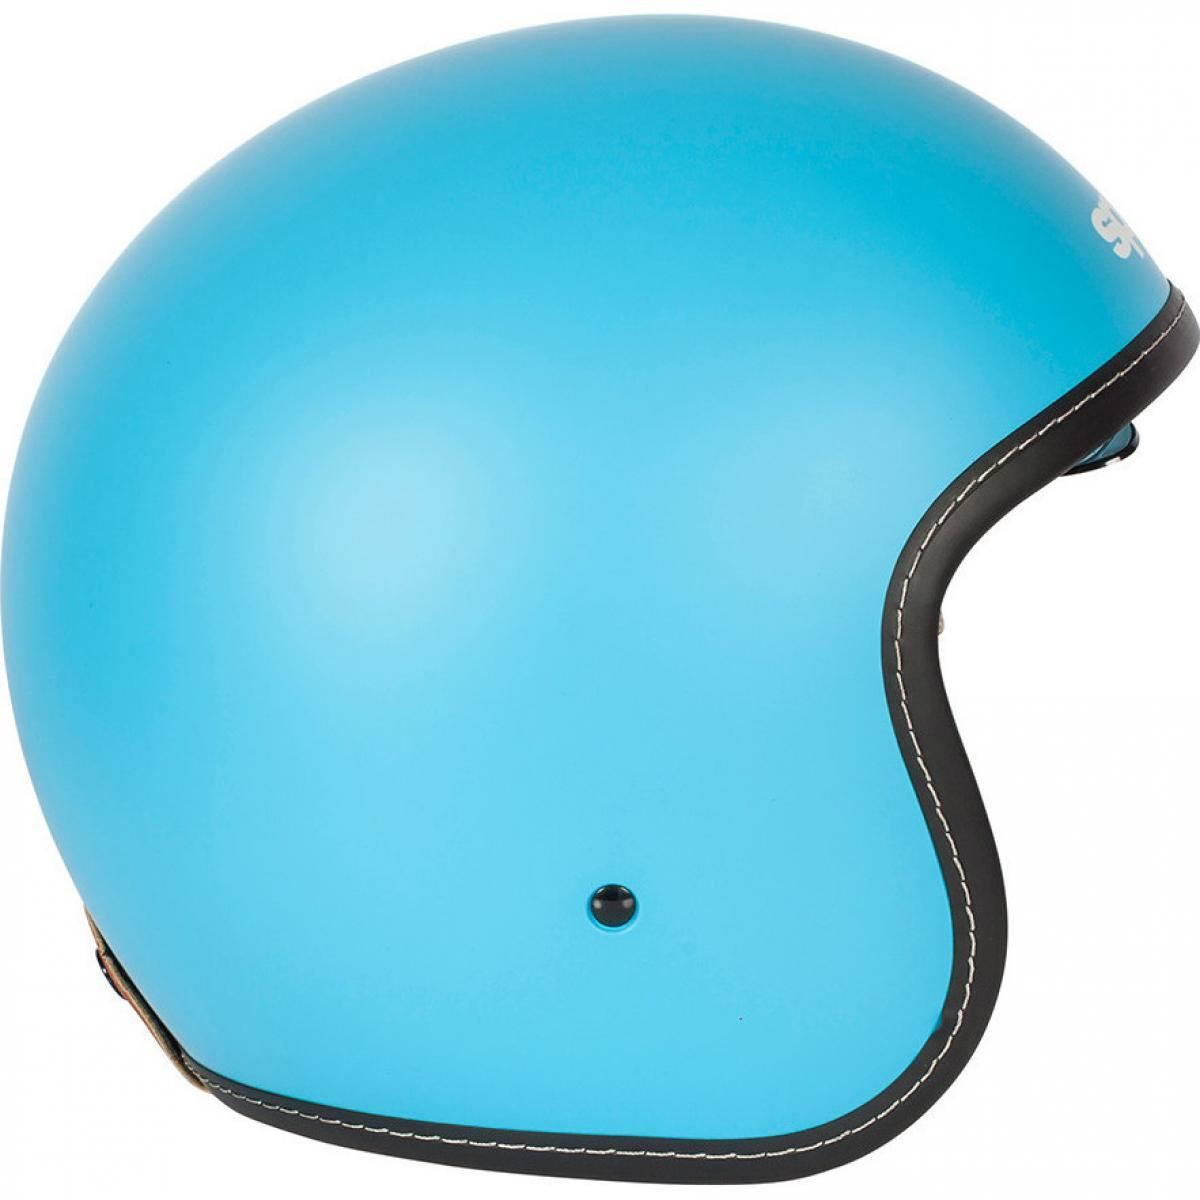 Spada-Raze-Ouvert-Casque-Bleu-Integre-Visiere miniature 19